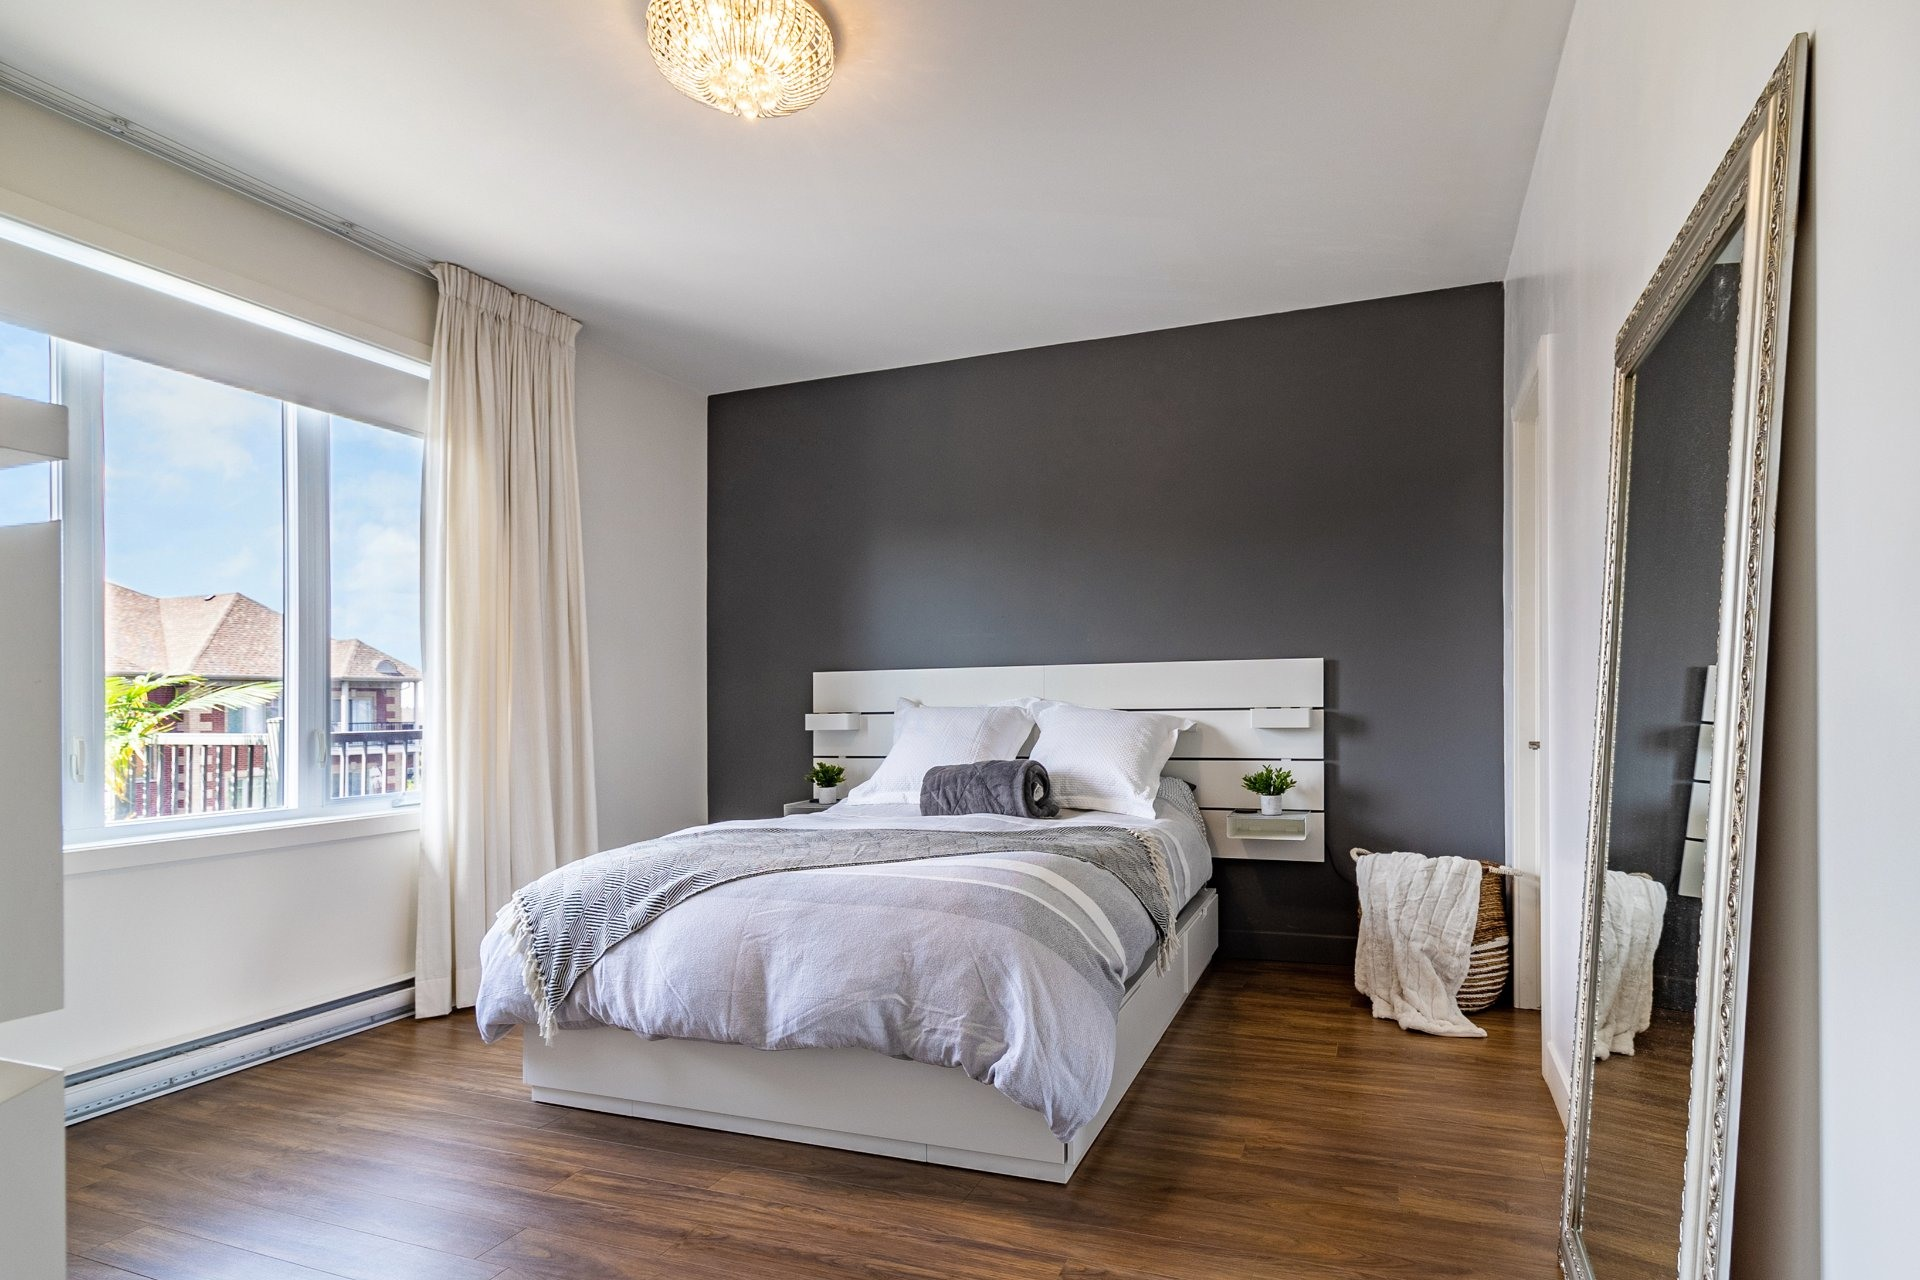 image 15 - Apartment For sale Saint-Hubert Longueuil  - 7 rooms